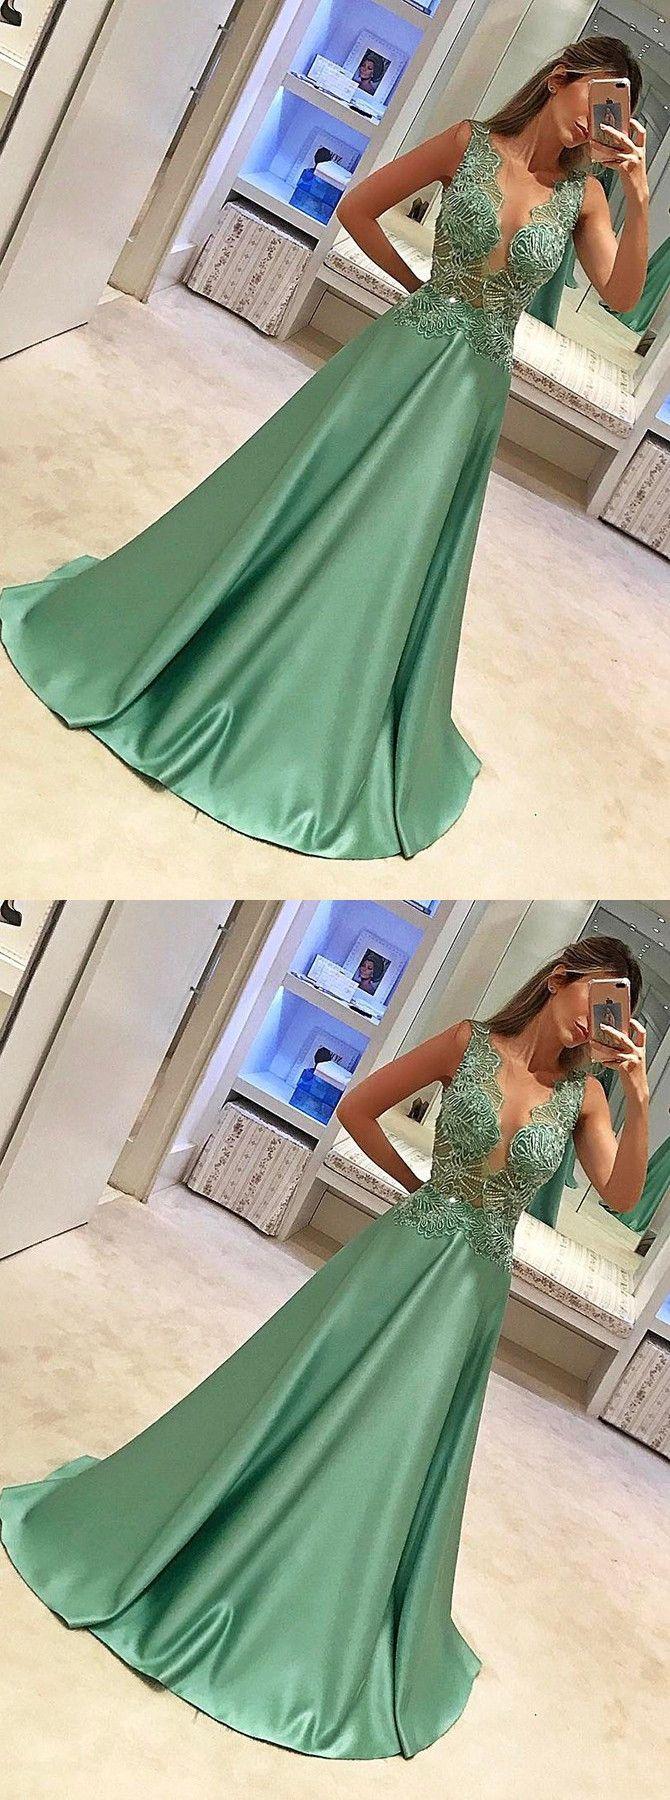 long prom dresses,unique prom dresses,green prom dresses,elegant prom dresses,beaded prom dresses @simpledress2480